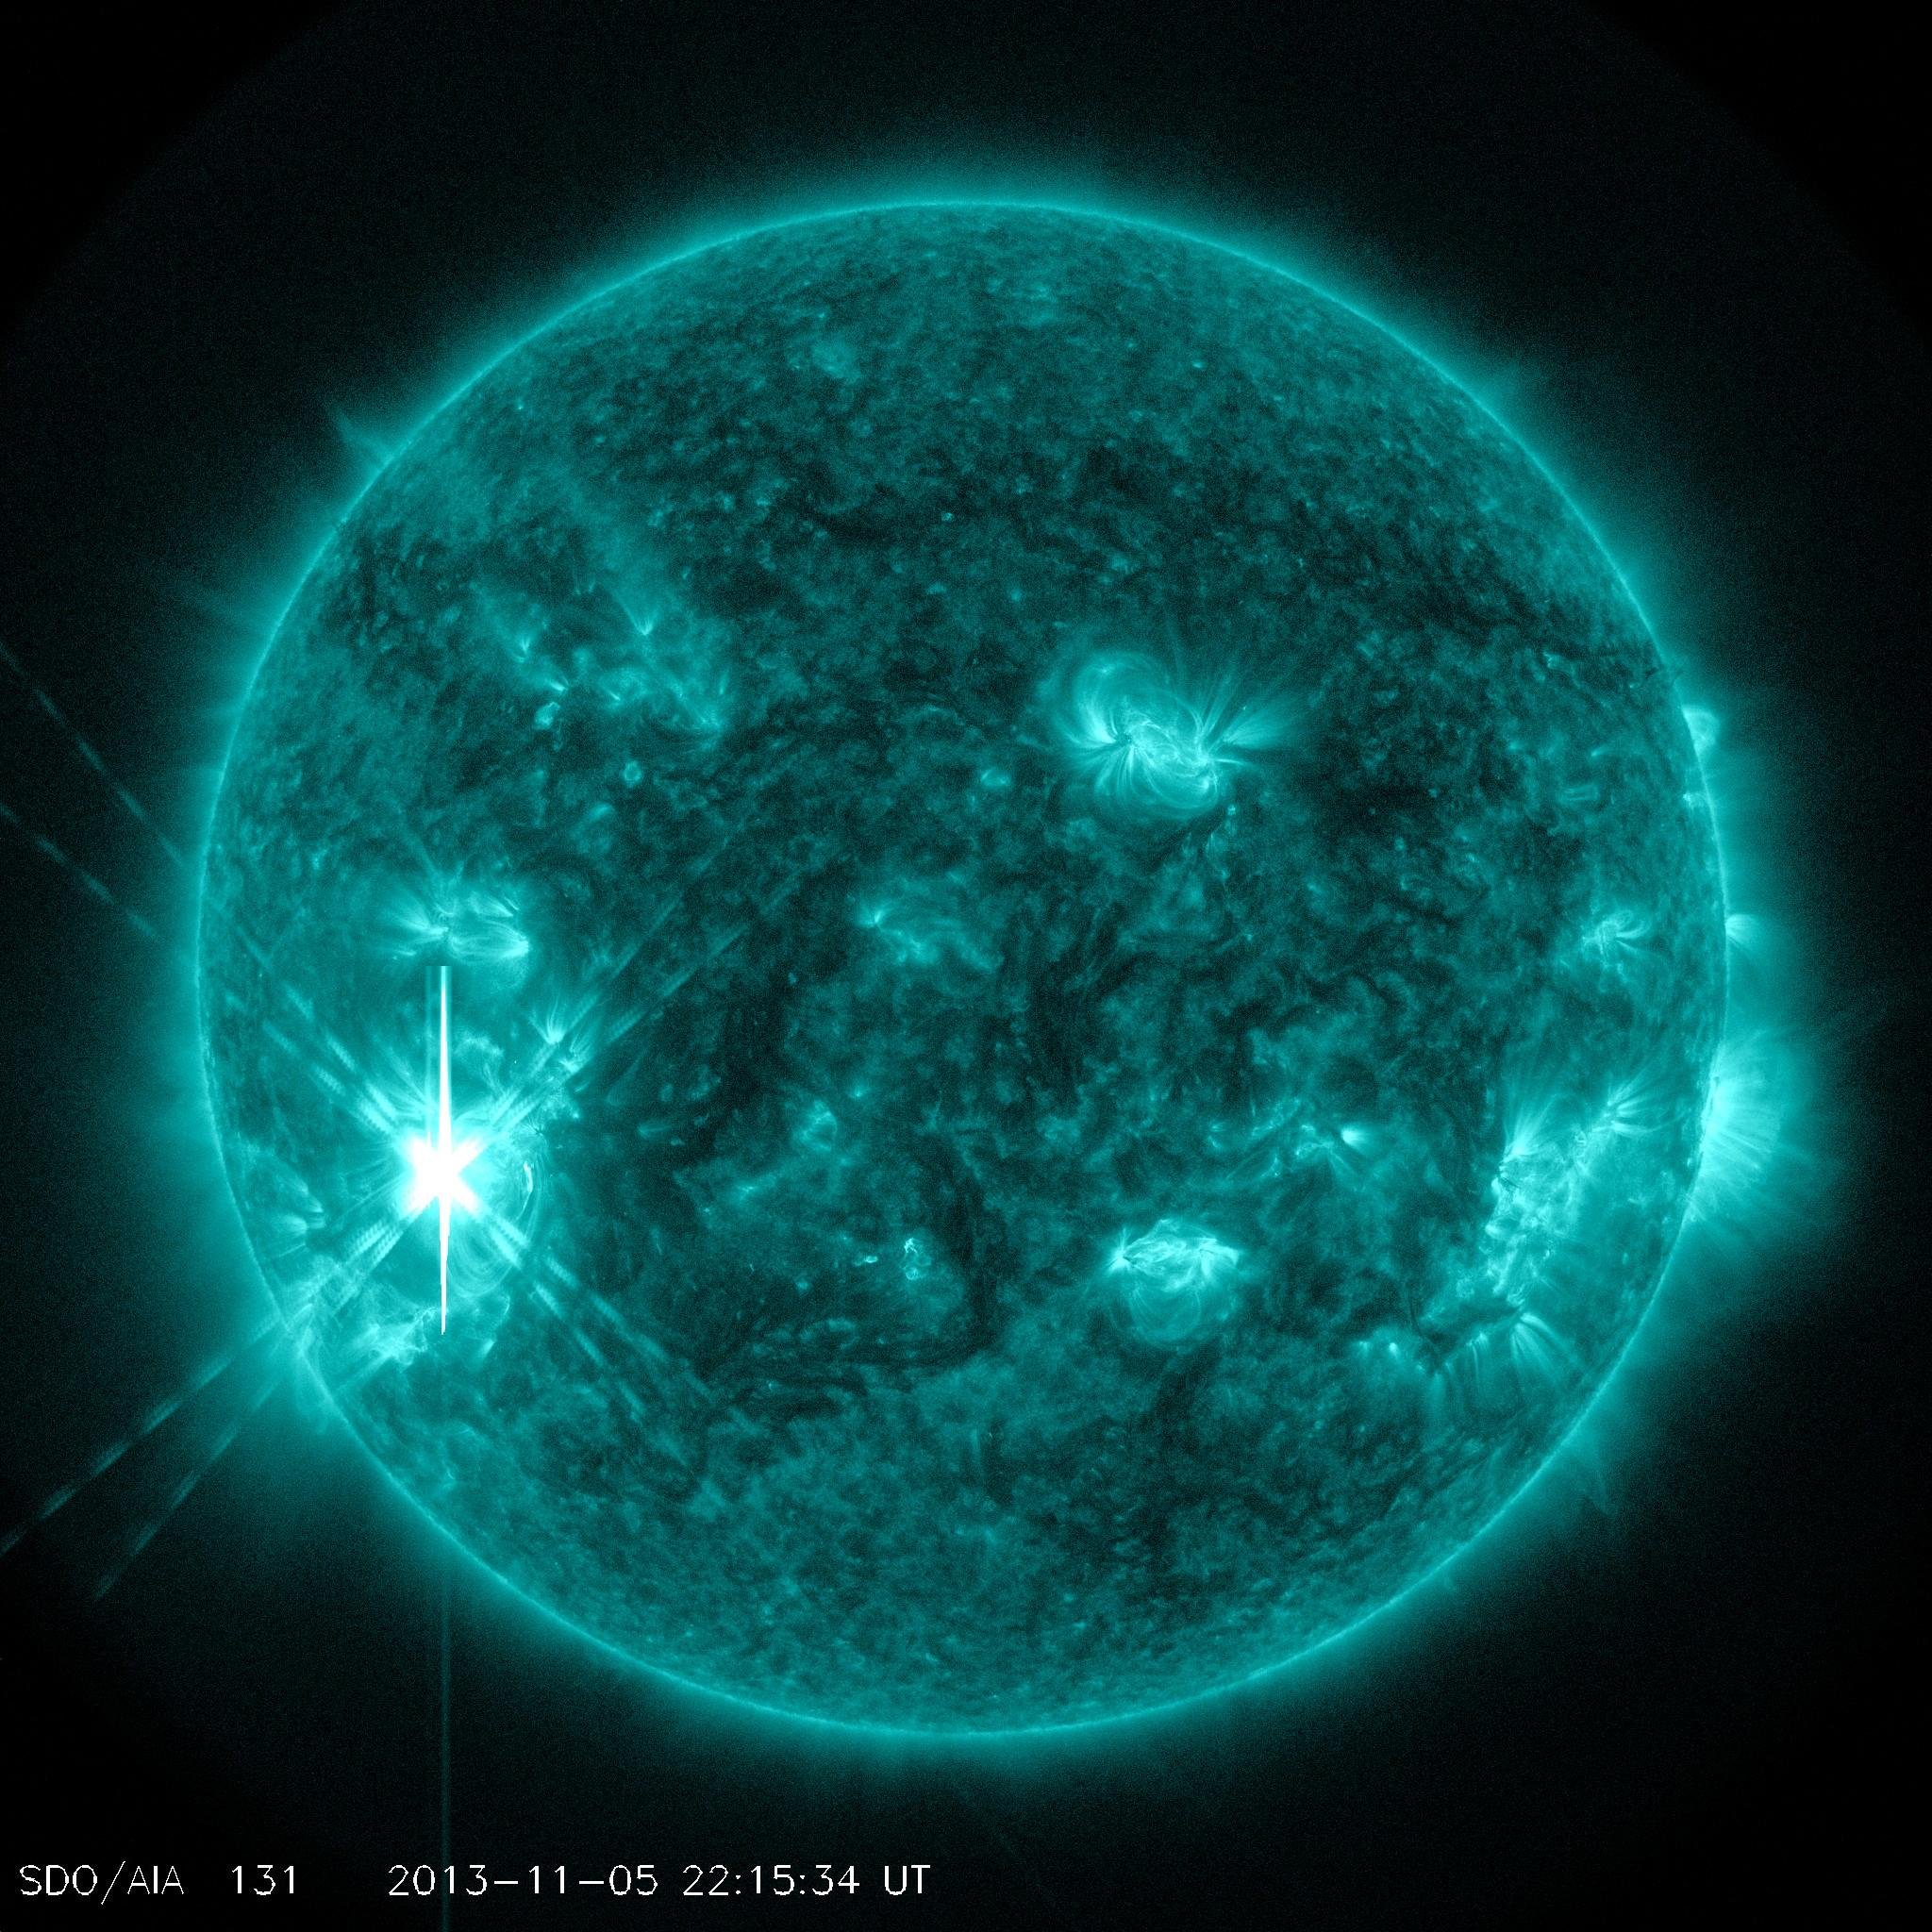 http://spaceweather.com/images2013/05nov13/x3.jpg?PHPSESSID=iet7592adeg4tnefnkpulm1co2